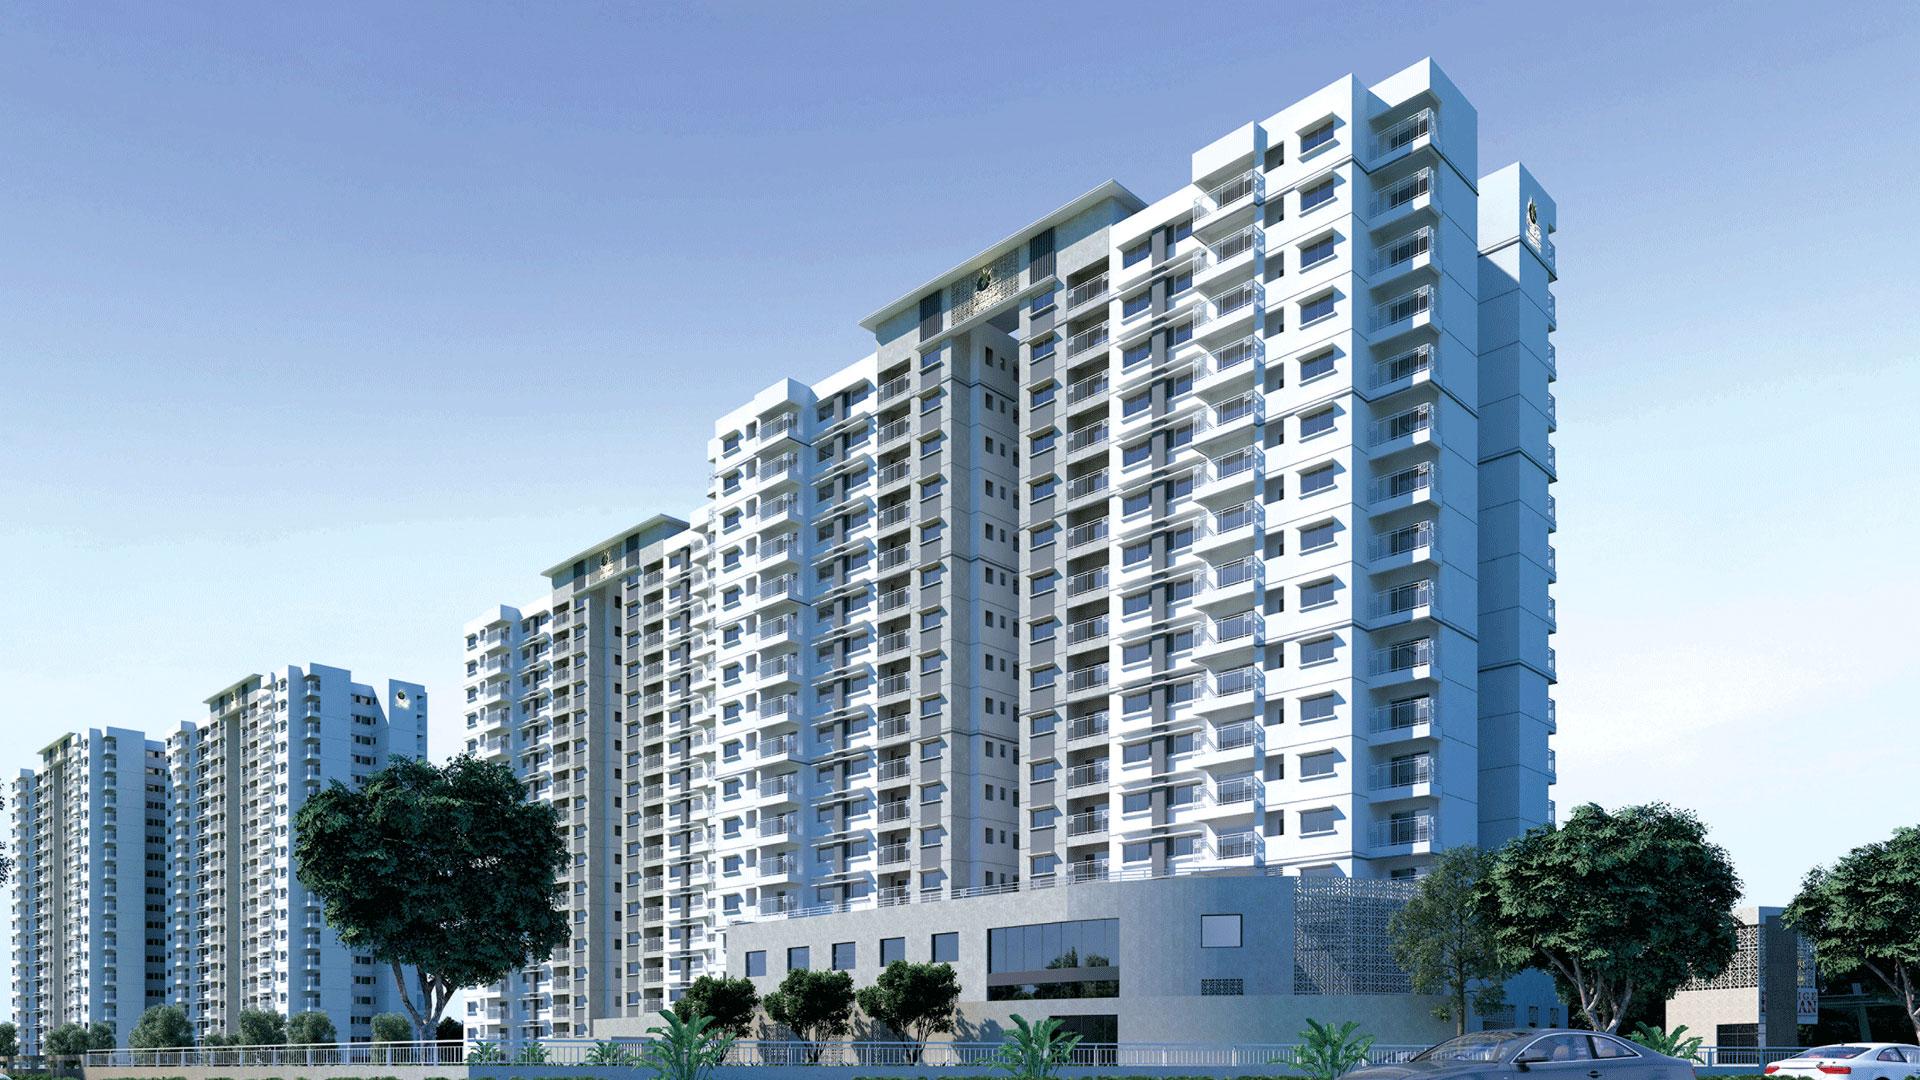 prestige-elysian-Apartment-in -Bannerghatta-Bangalore-Image-03